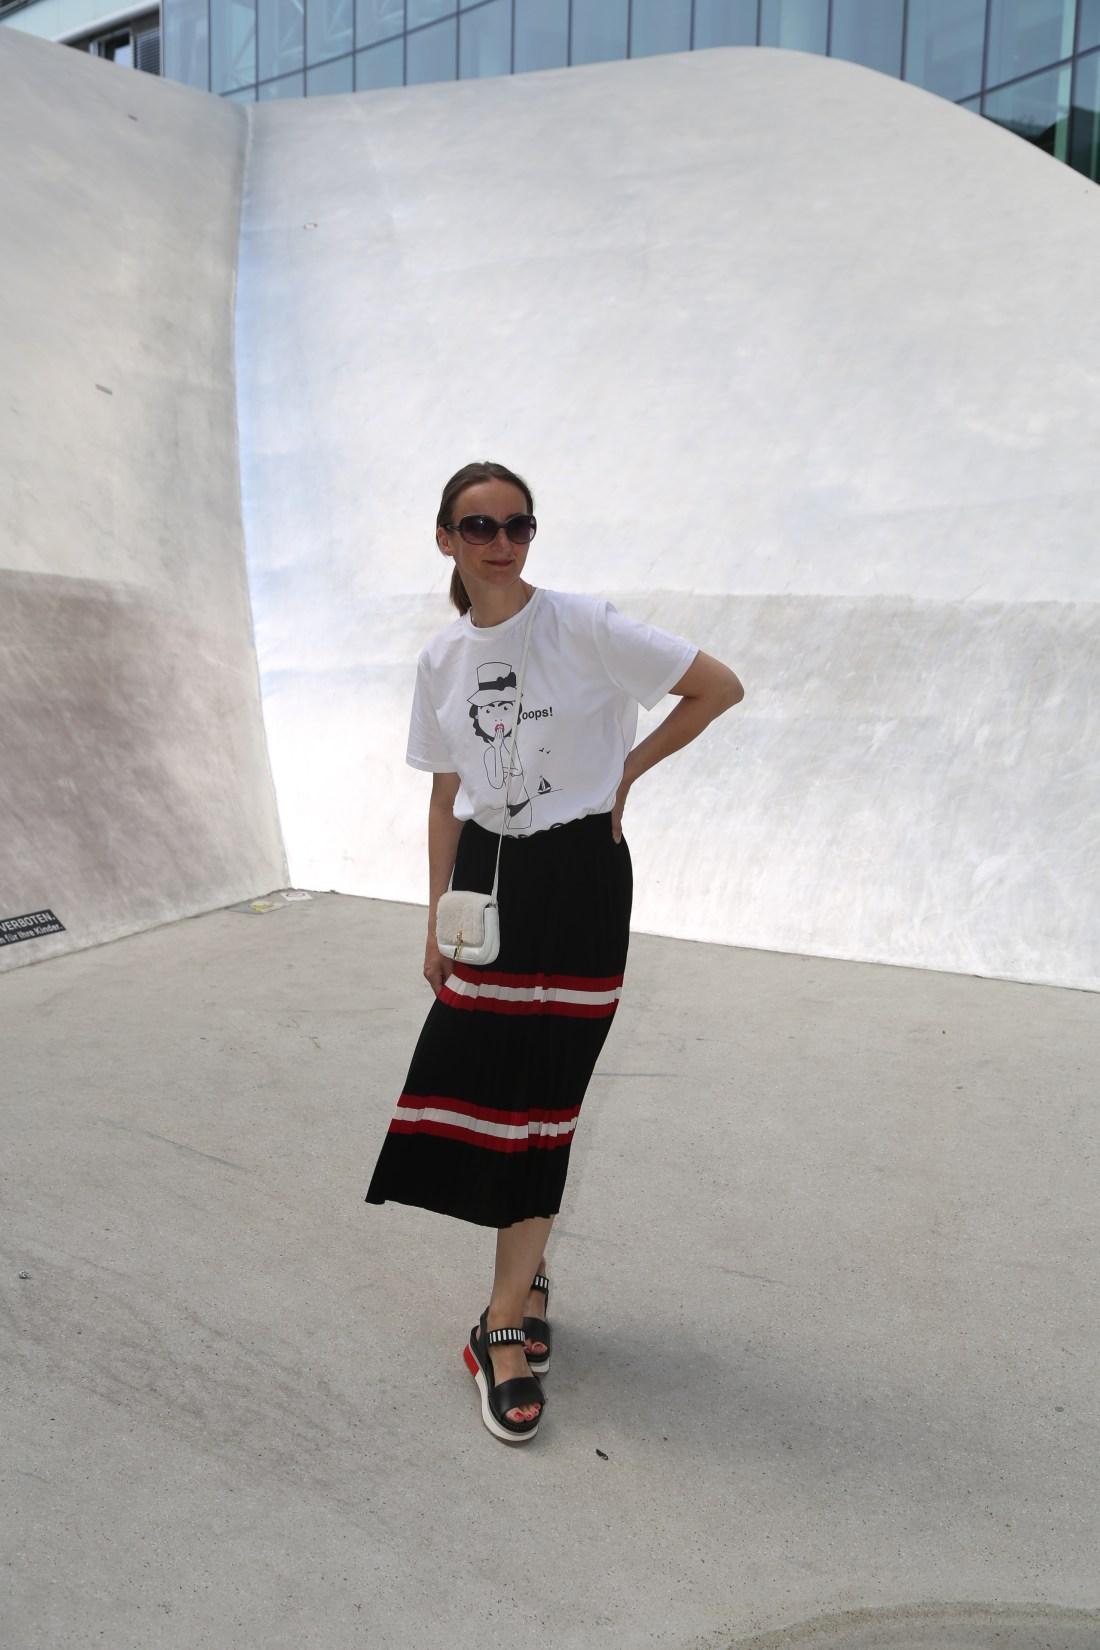 oceanblue-style_faltenrock_sandalen_prada_art-shoes_t-shirt_chanel_tasche-klein_plateau-sandalen_mode-blog-ü40 (2)